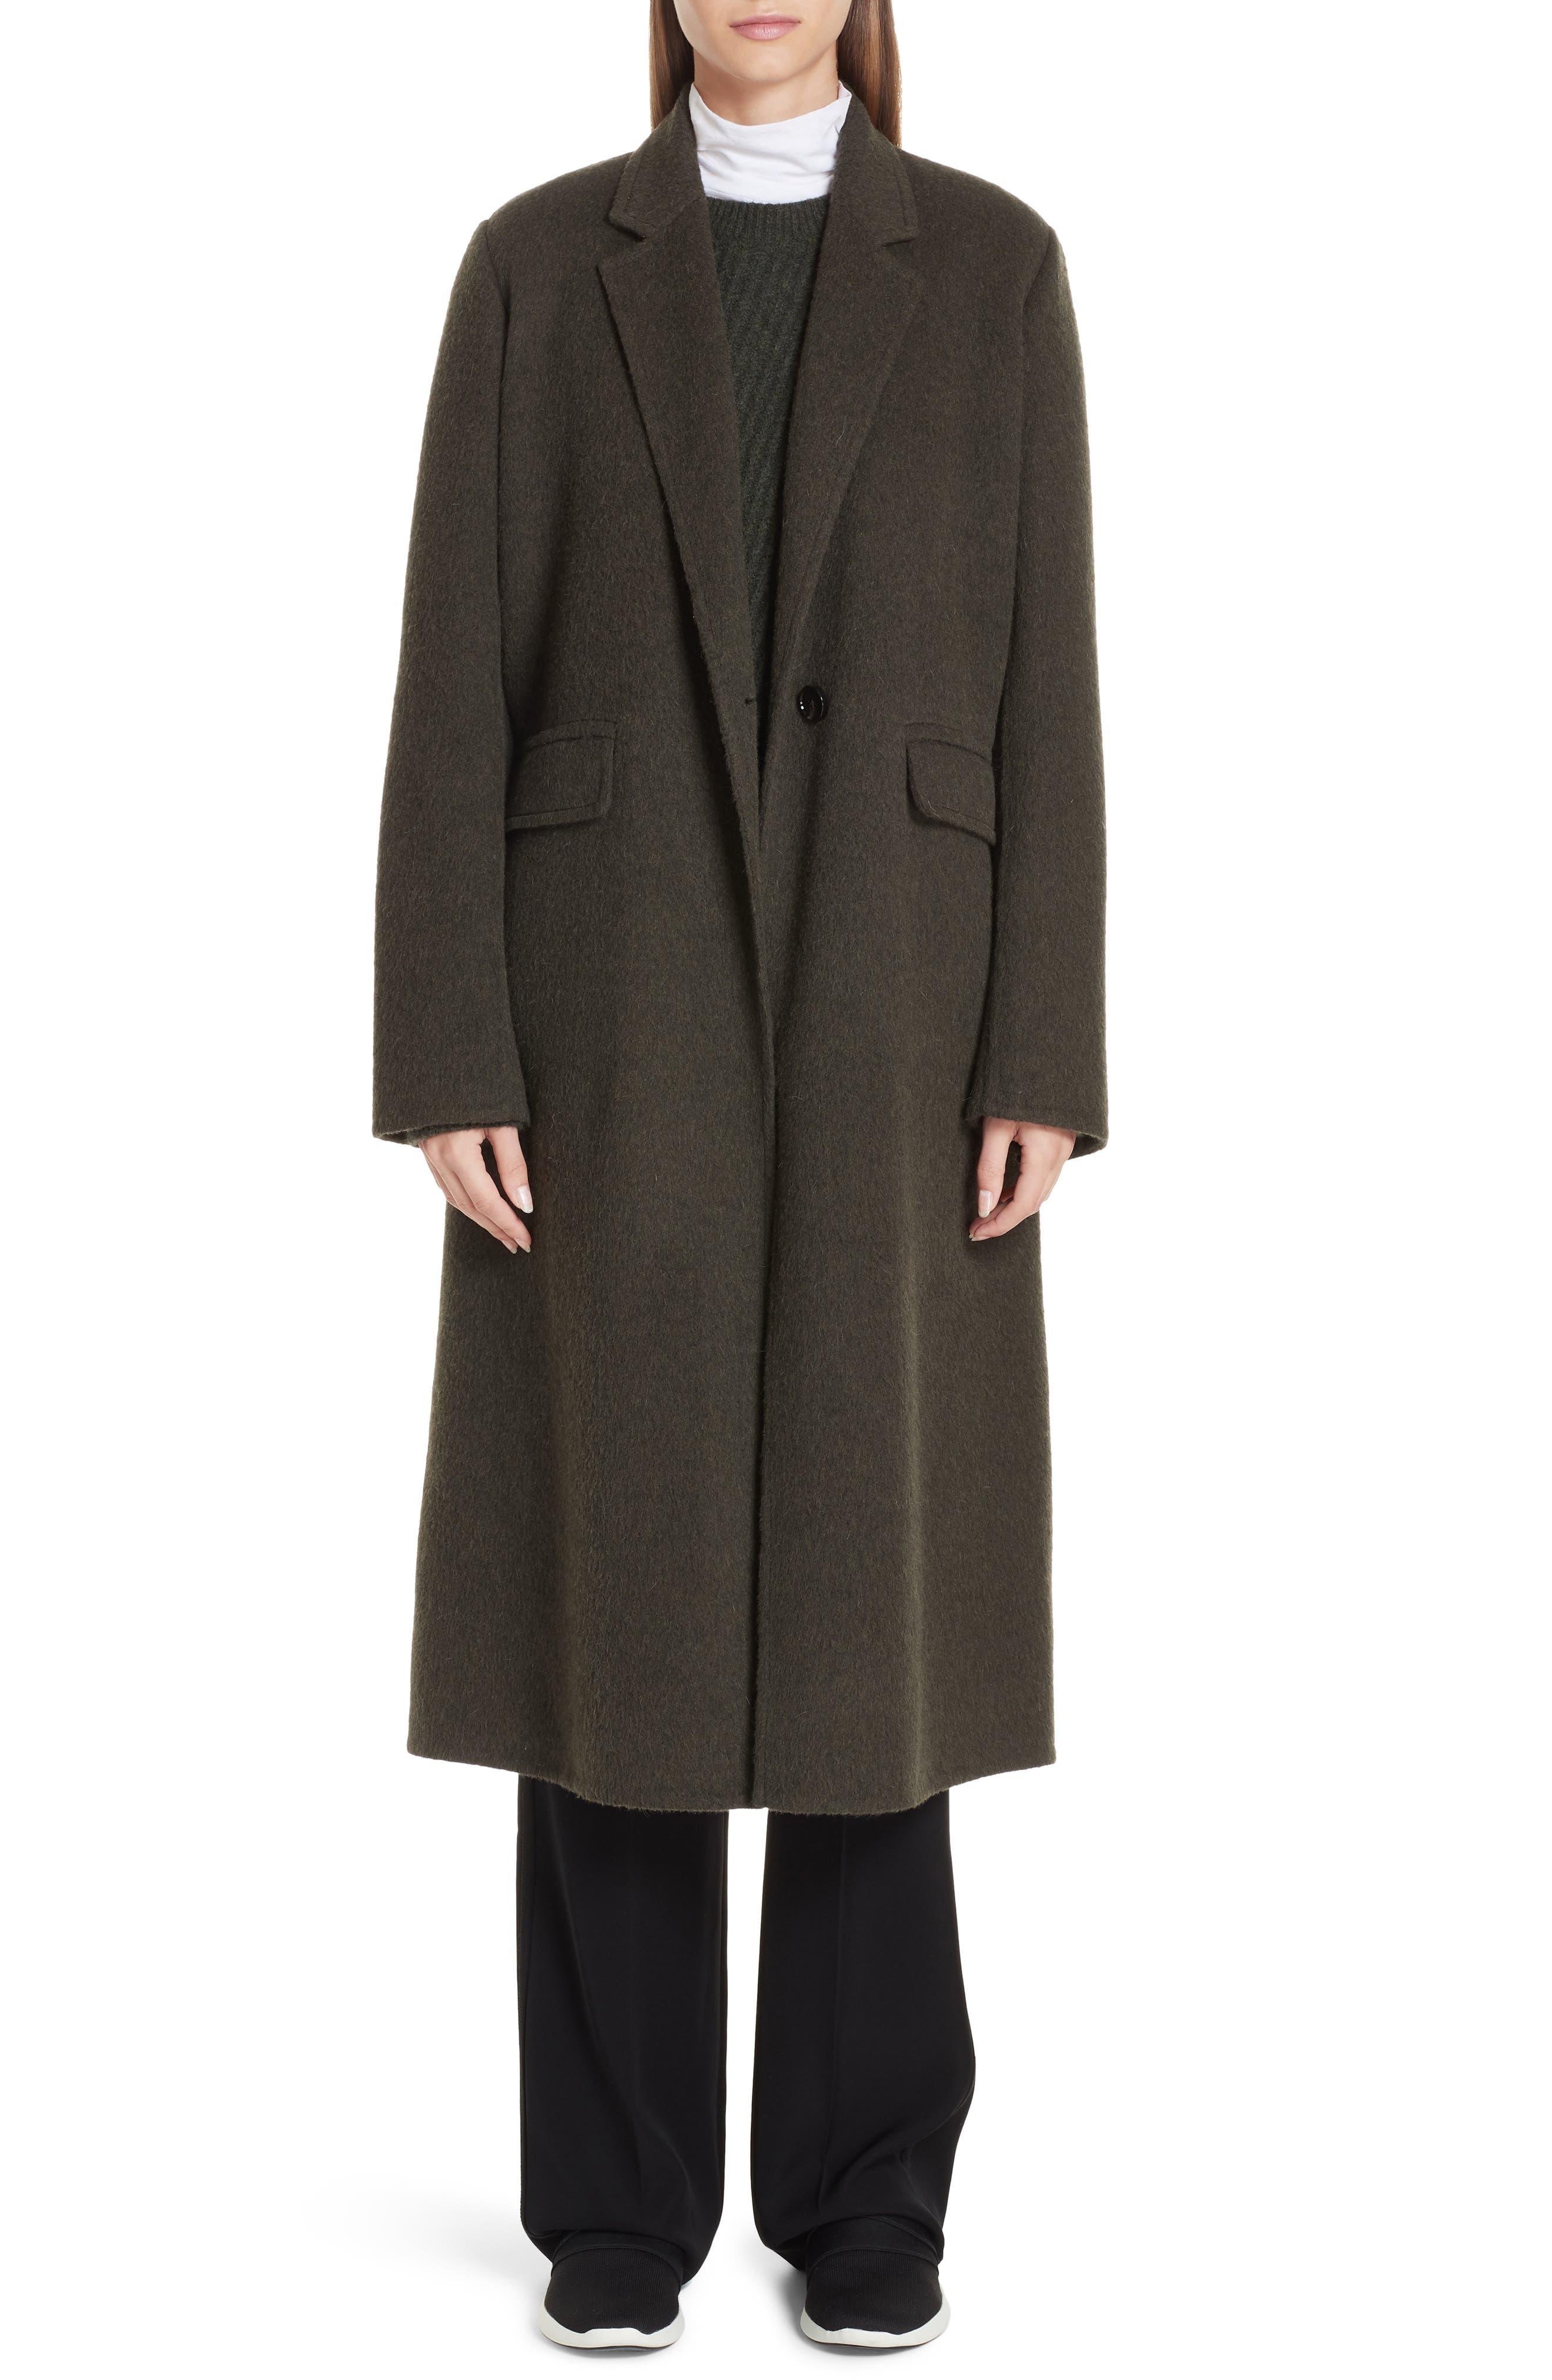 VINCE,                             Long Wool Alpaca Blend Coat,                             Alternate thumbnail 8, color,                             341